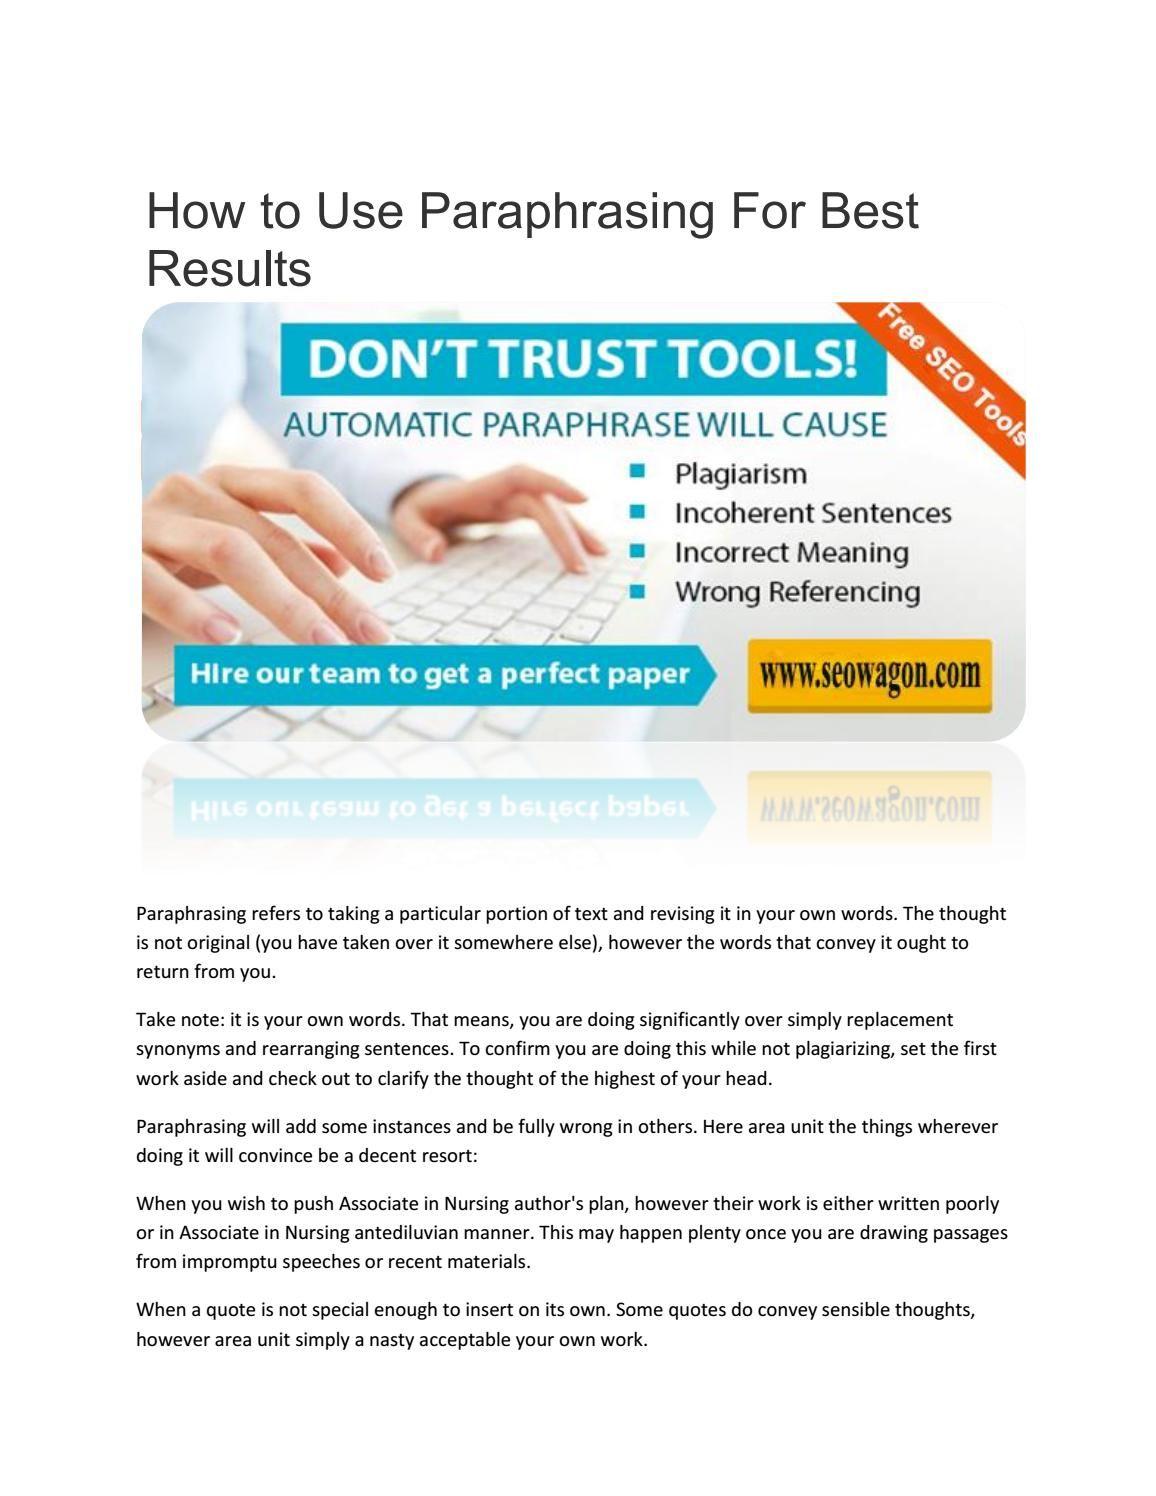 Online Paraphrasing Tool Best Plagiarism Checker Myself Essay